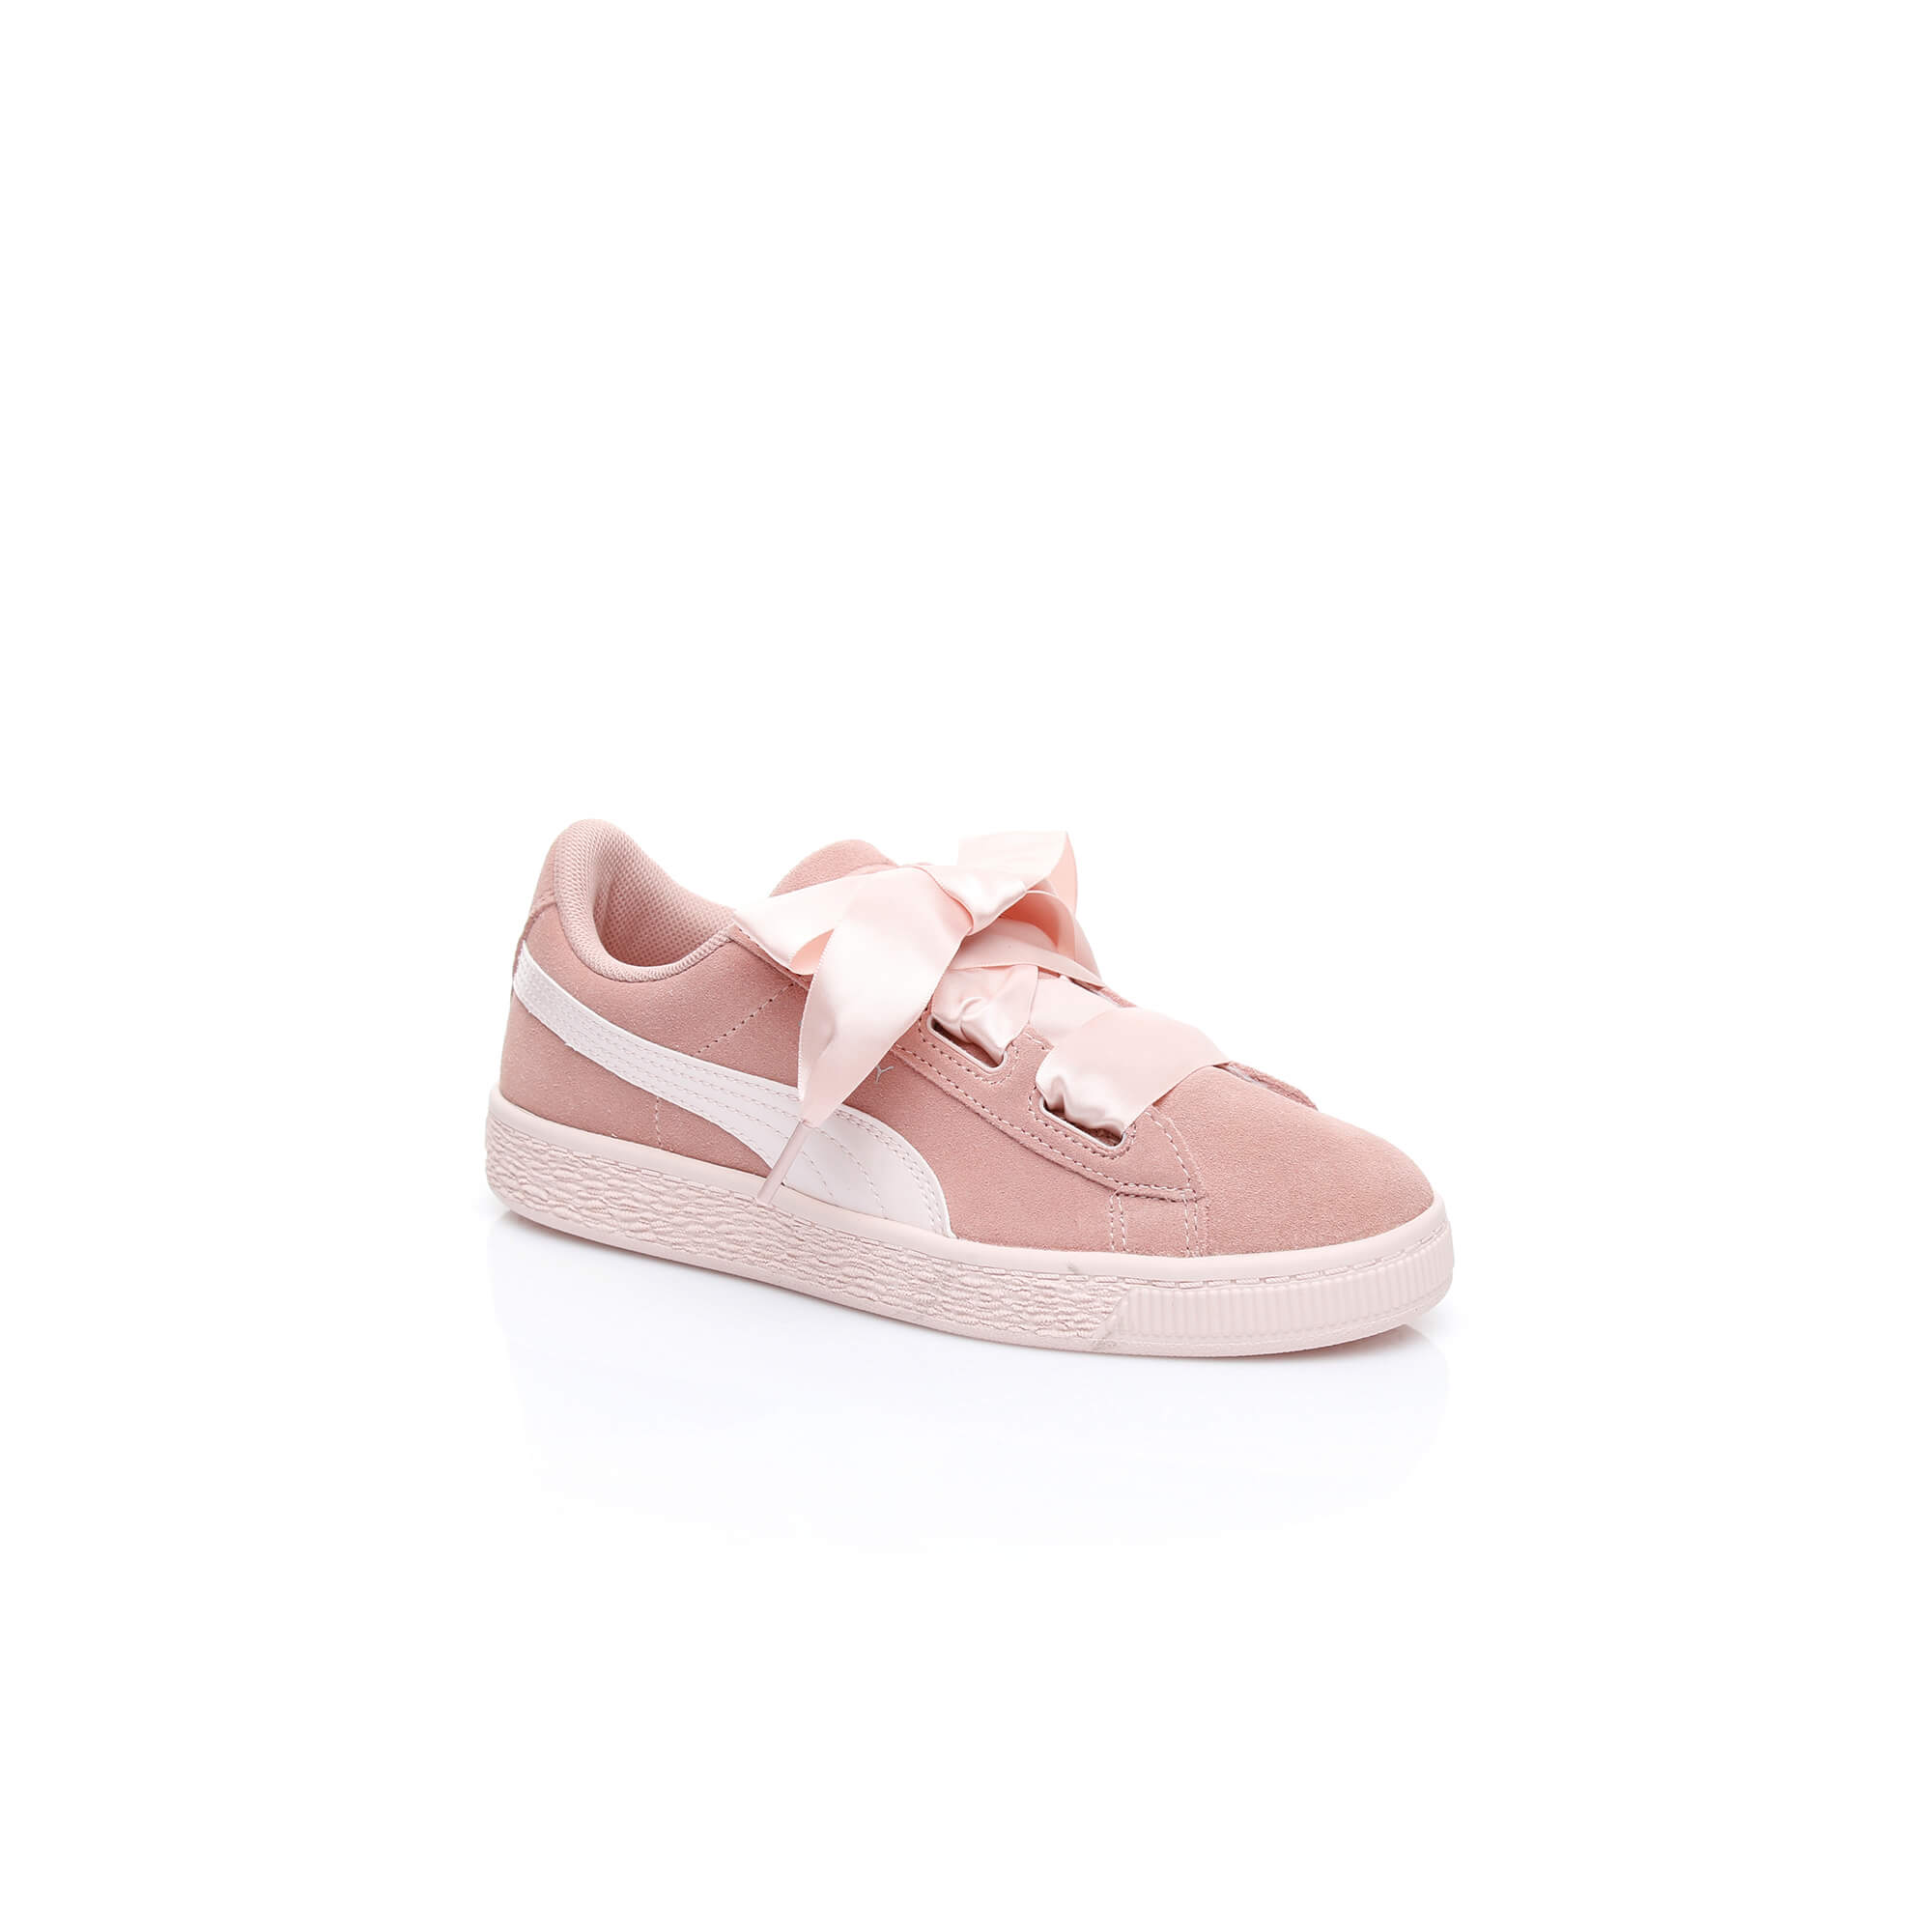 Puma Heart Jewel Çocuk Pembe Sneaker